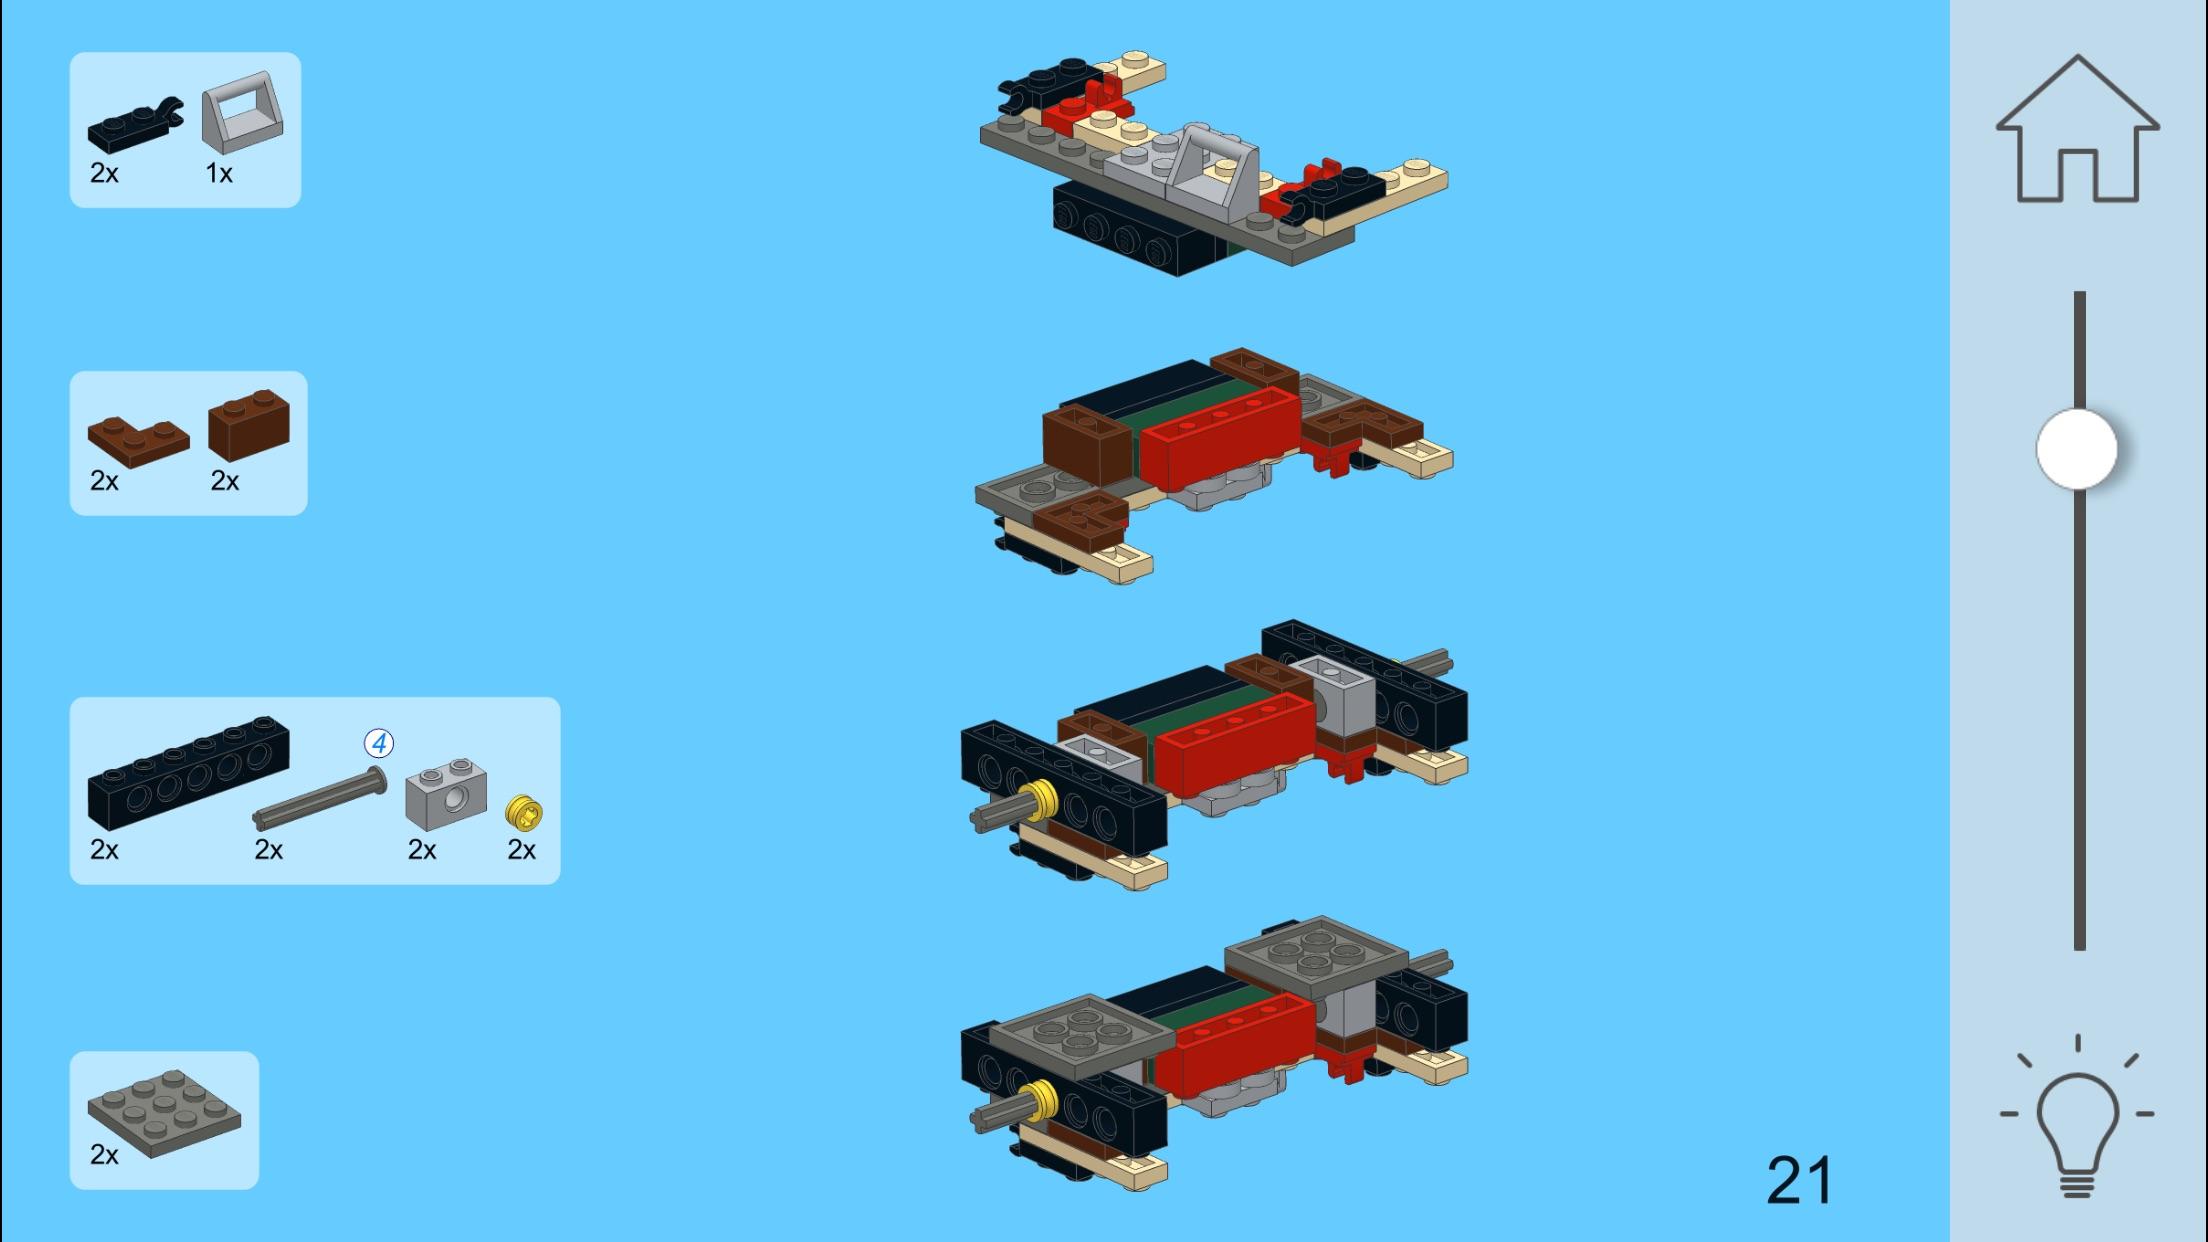 Green 911 for LEGO 10242 Set Screenshot